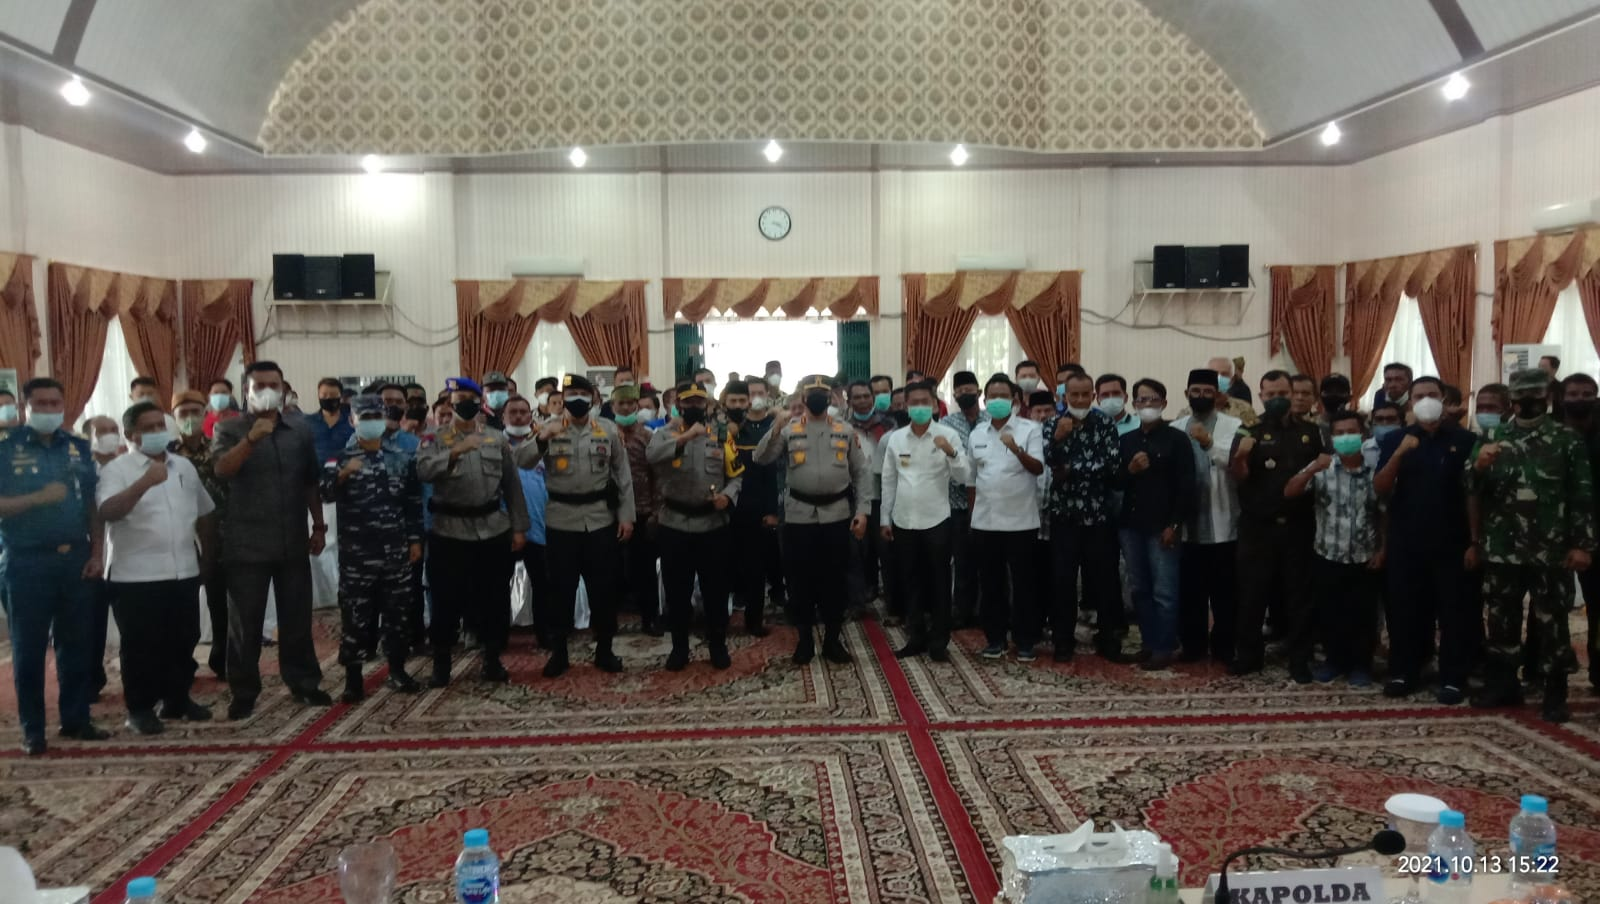 Kapolda Riau: Rohil Harus Bisa Memproduksi Produk Turunan CPO